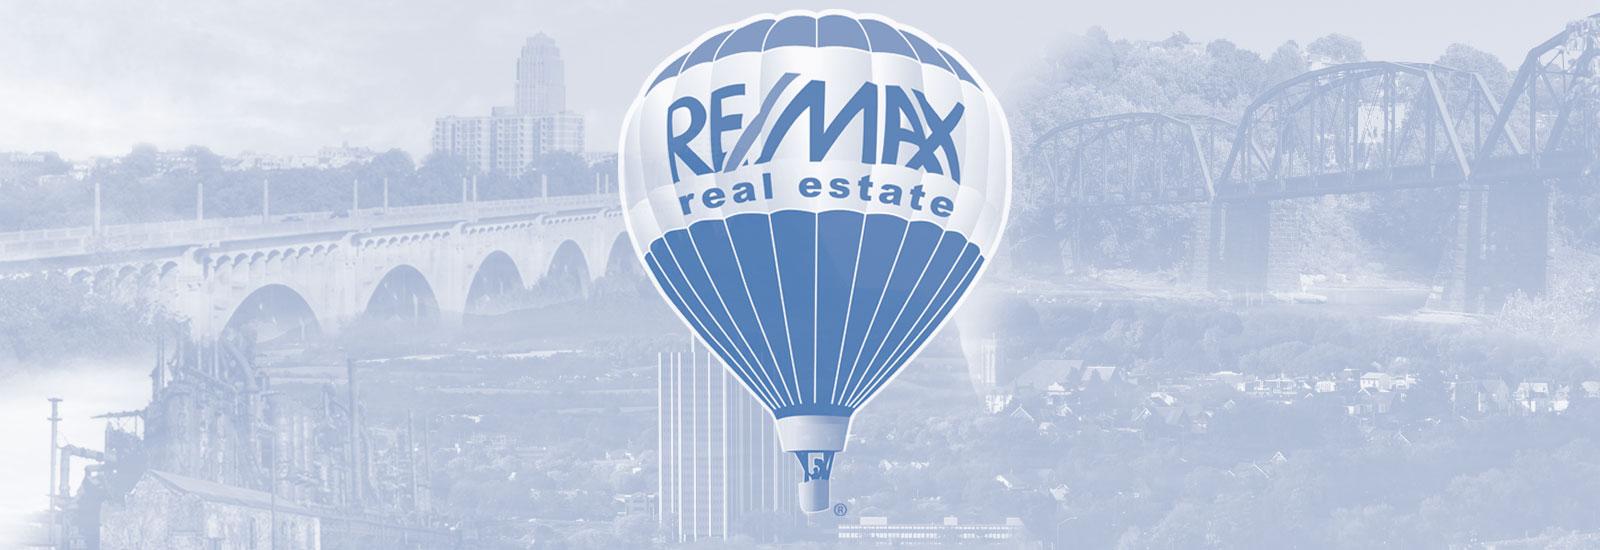 RE/MAX real estate Marketing